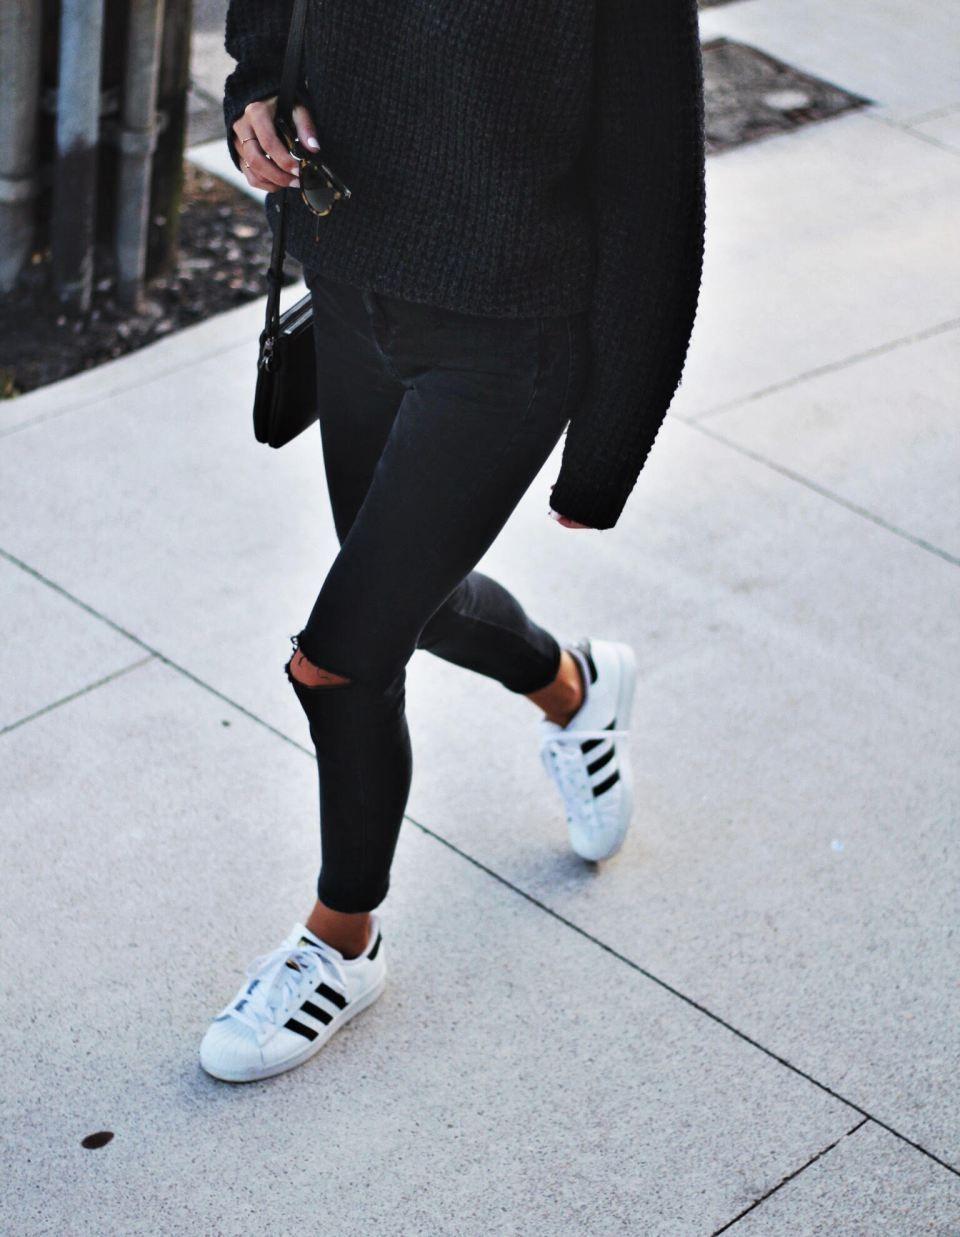 Superstars Outfit En Moda Adidas …Outfits 2019 TrabajoY Ropa wkuTlPXOZi